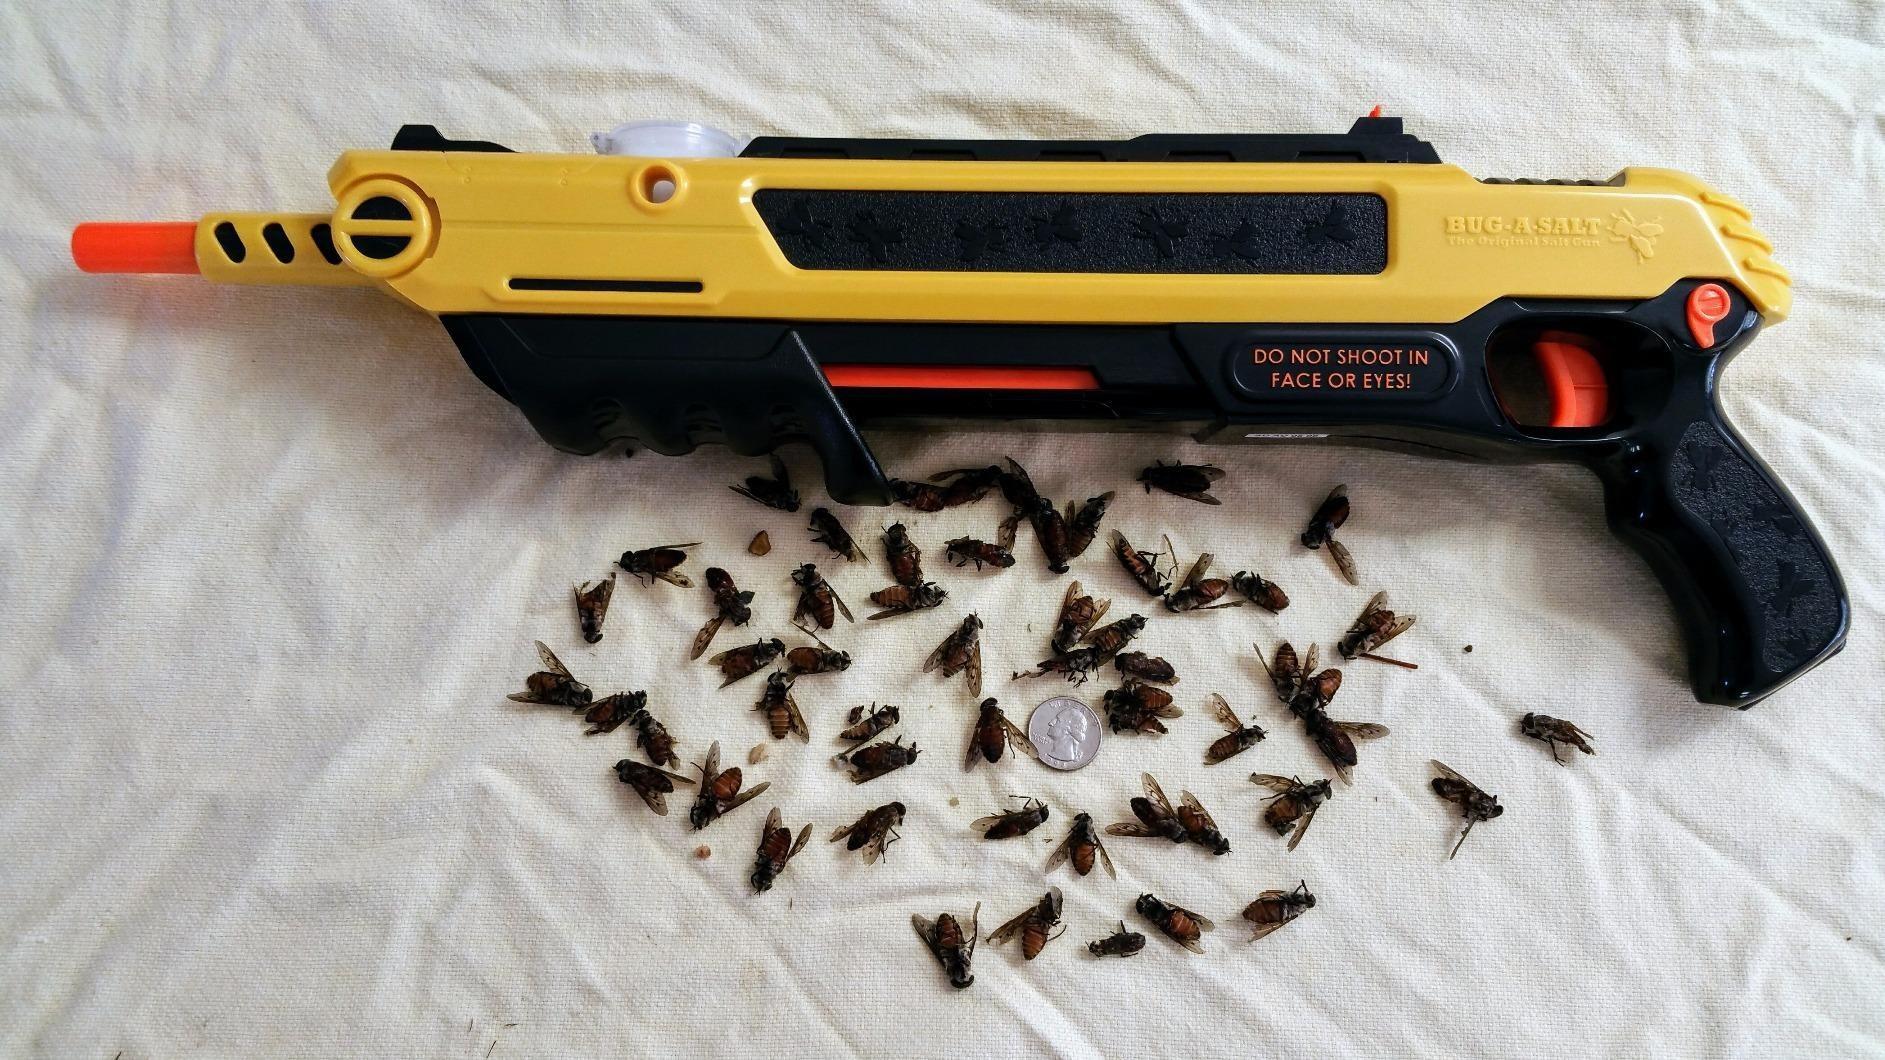 gun shown with many dead flies